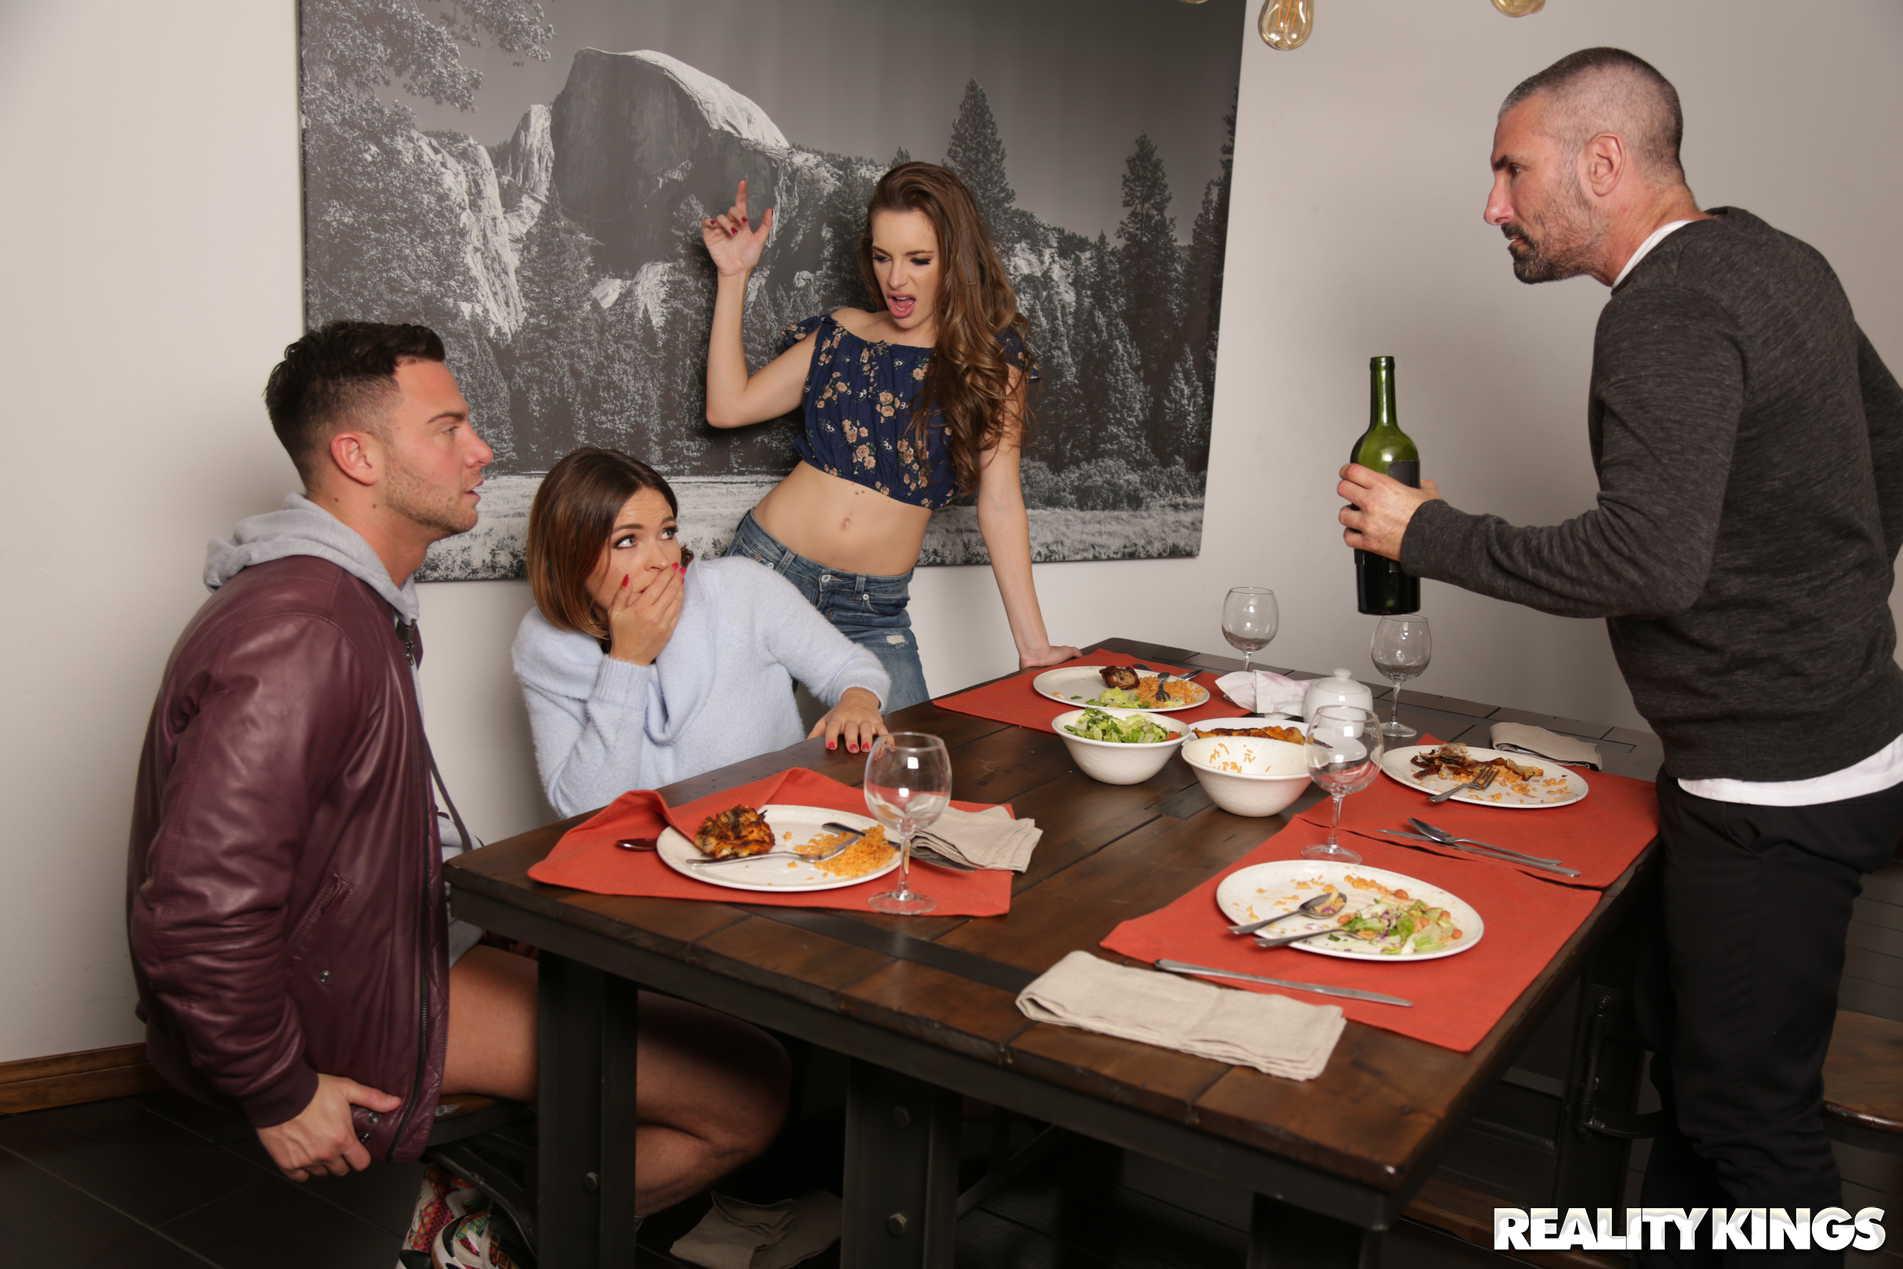 Reality Kings 'My Daughters New Boyfriend' starring Krissy Lynn (Photo 176)